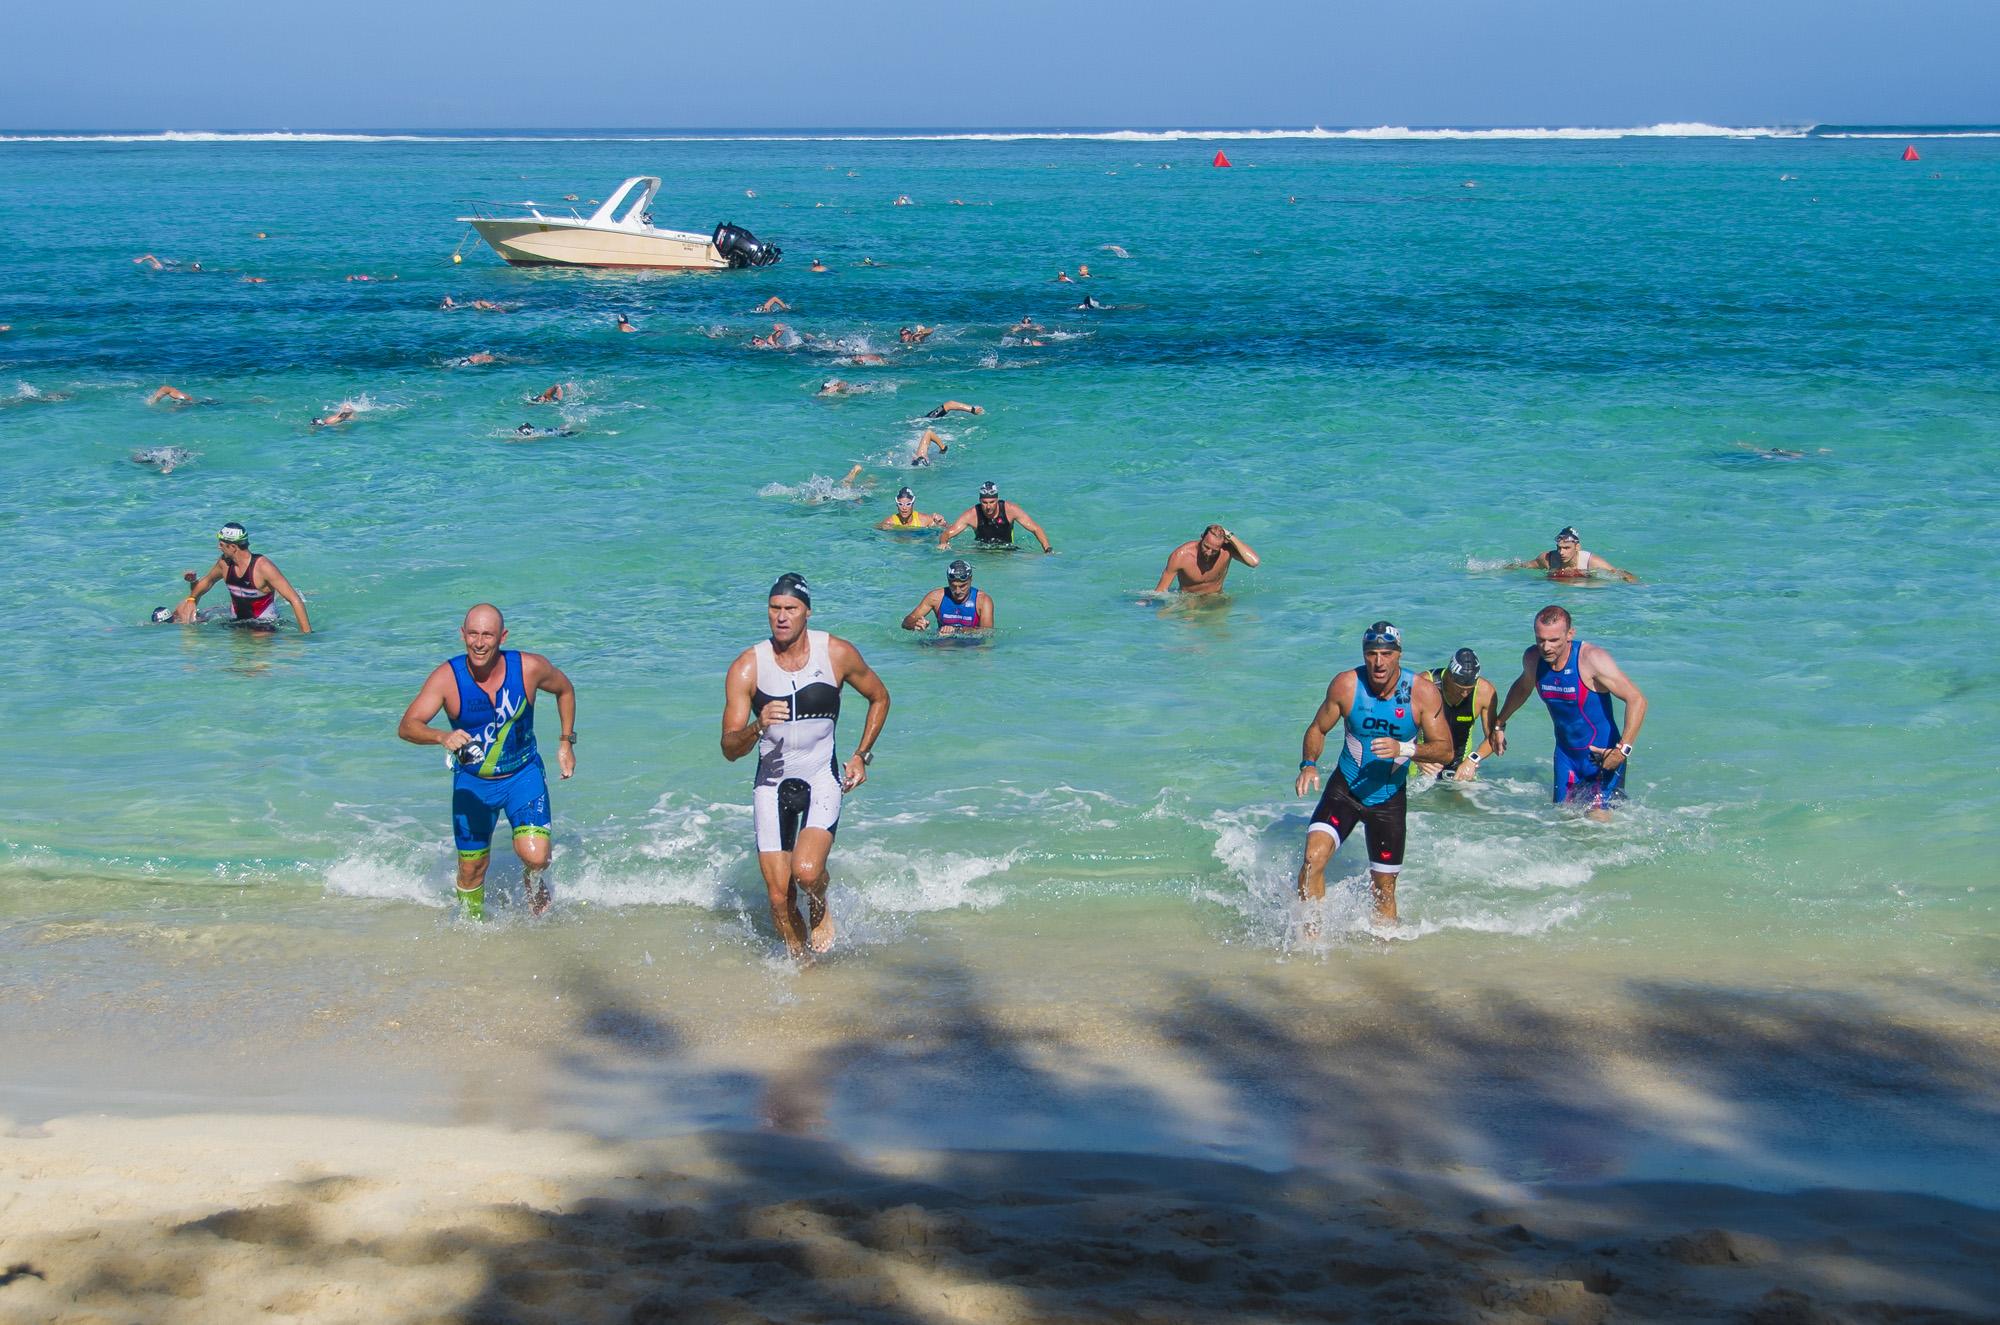 Indian Ocean Triathlon 2016-100_1.jpg